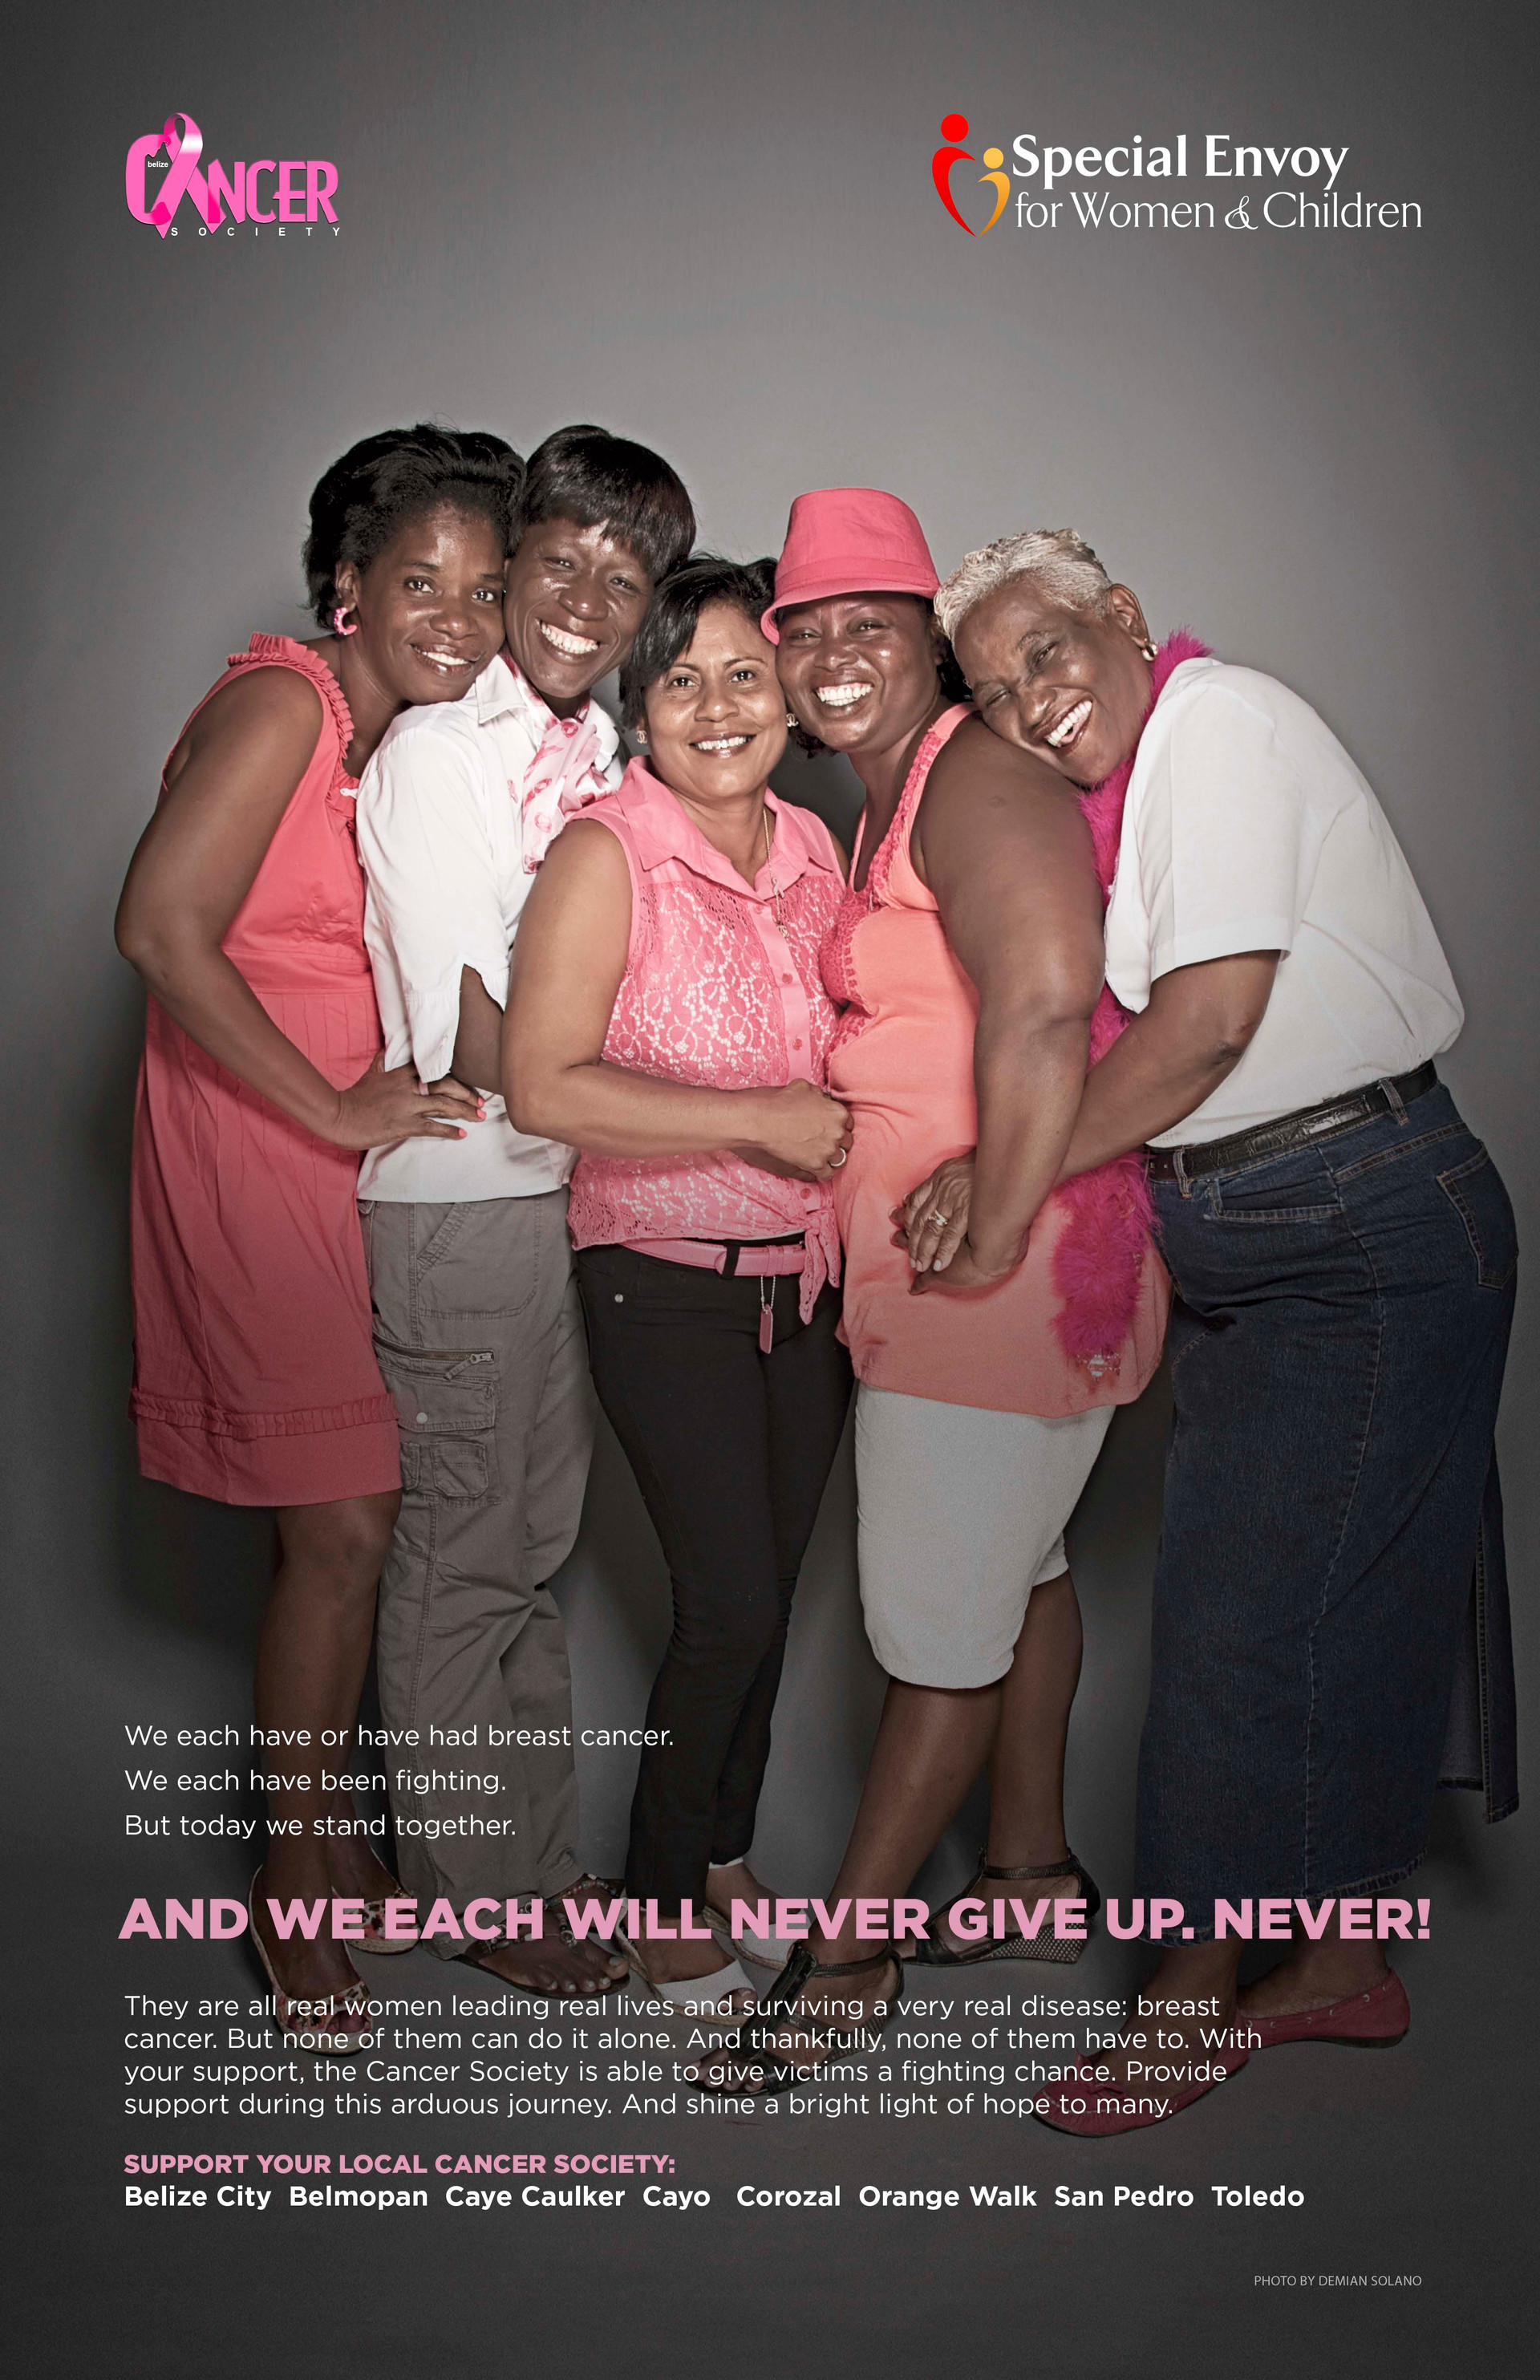 Cancer_Survivors_poster-01.jpg